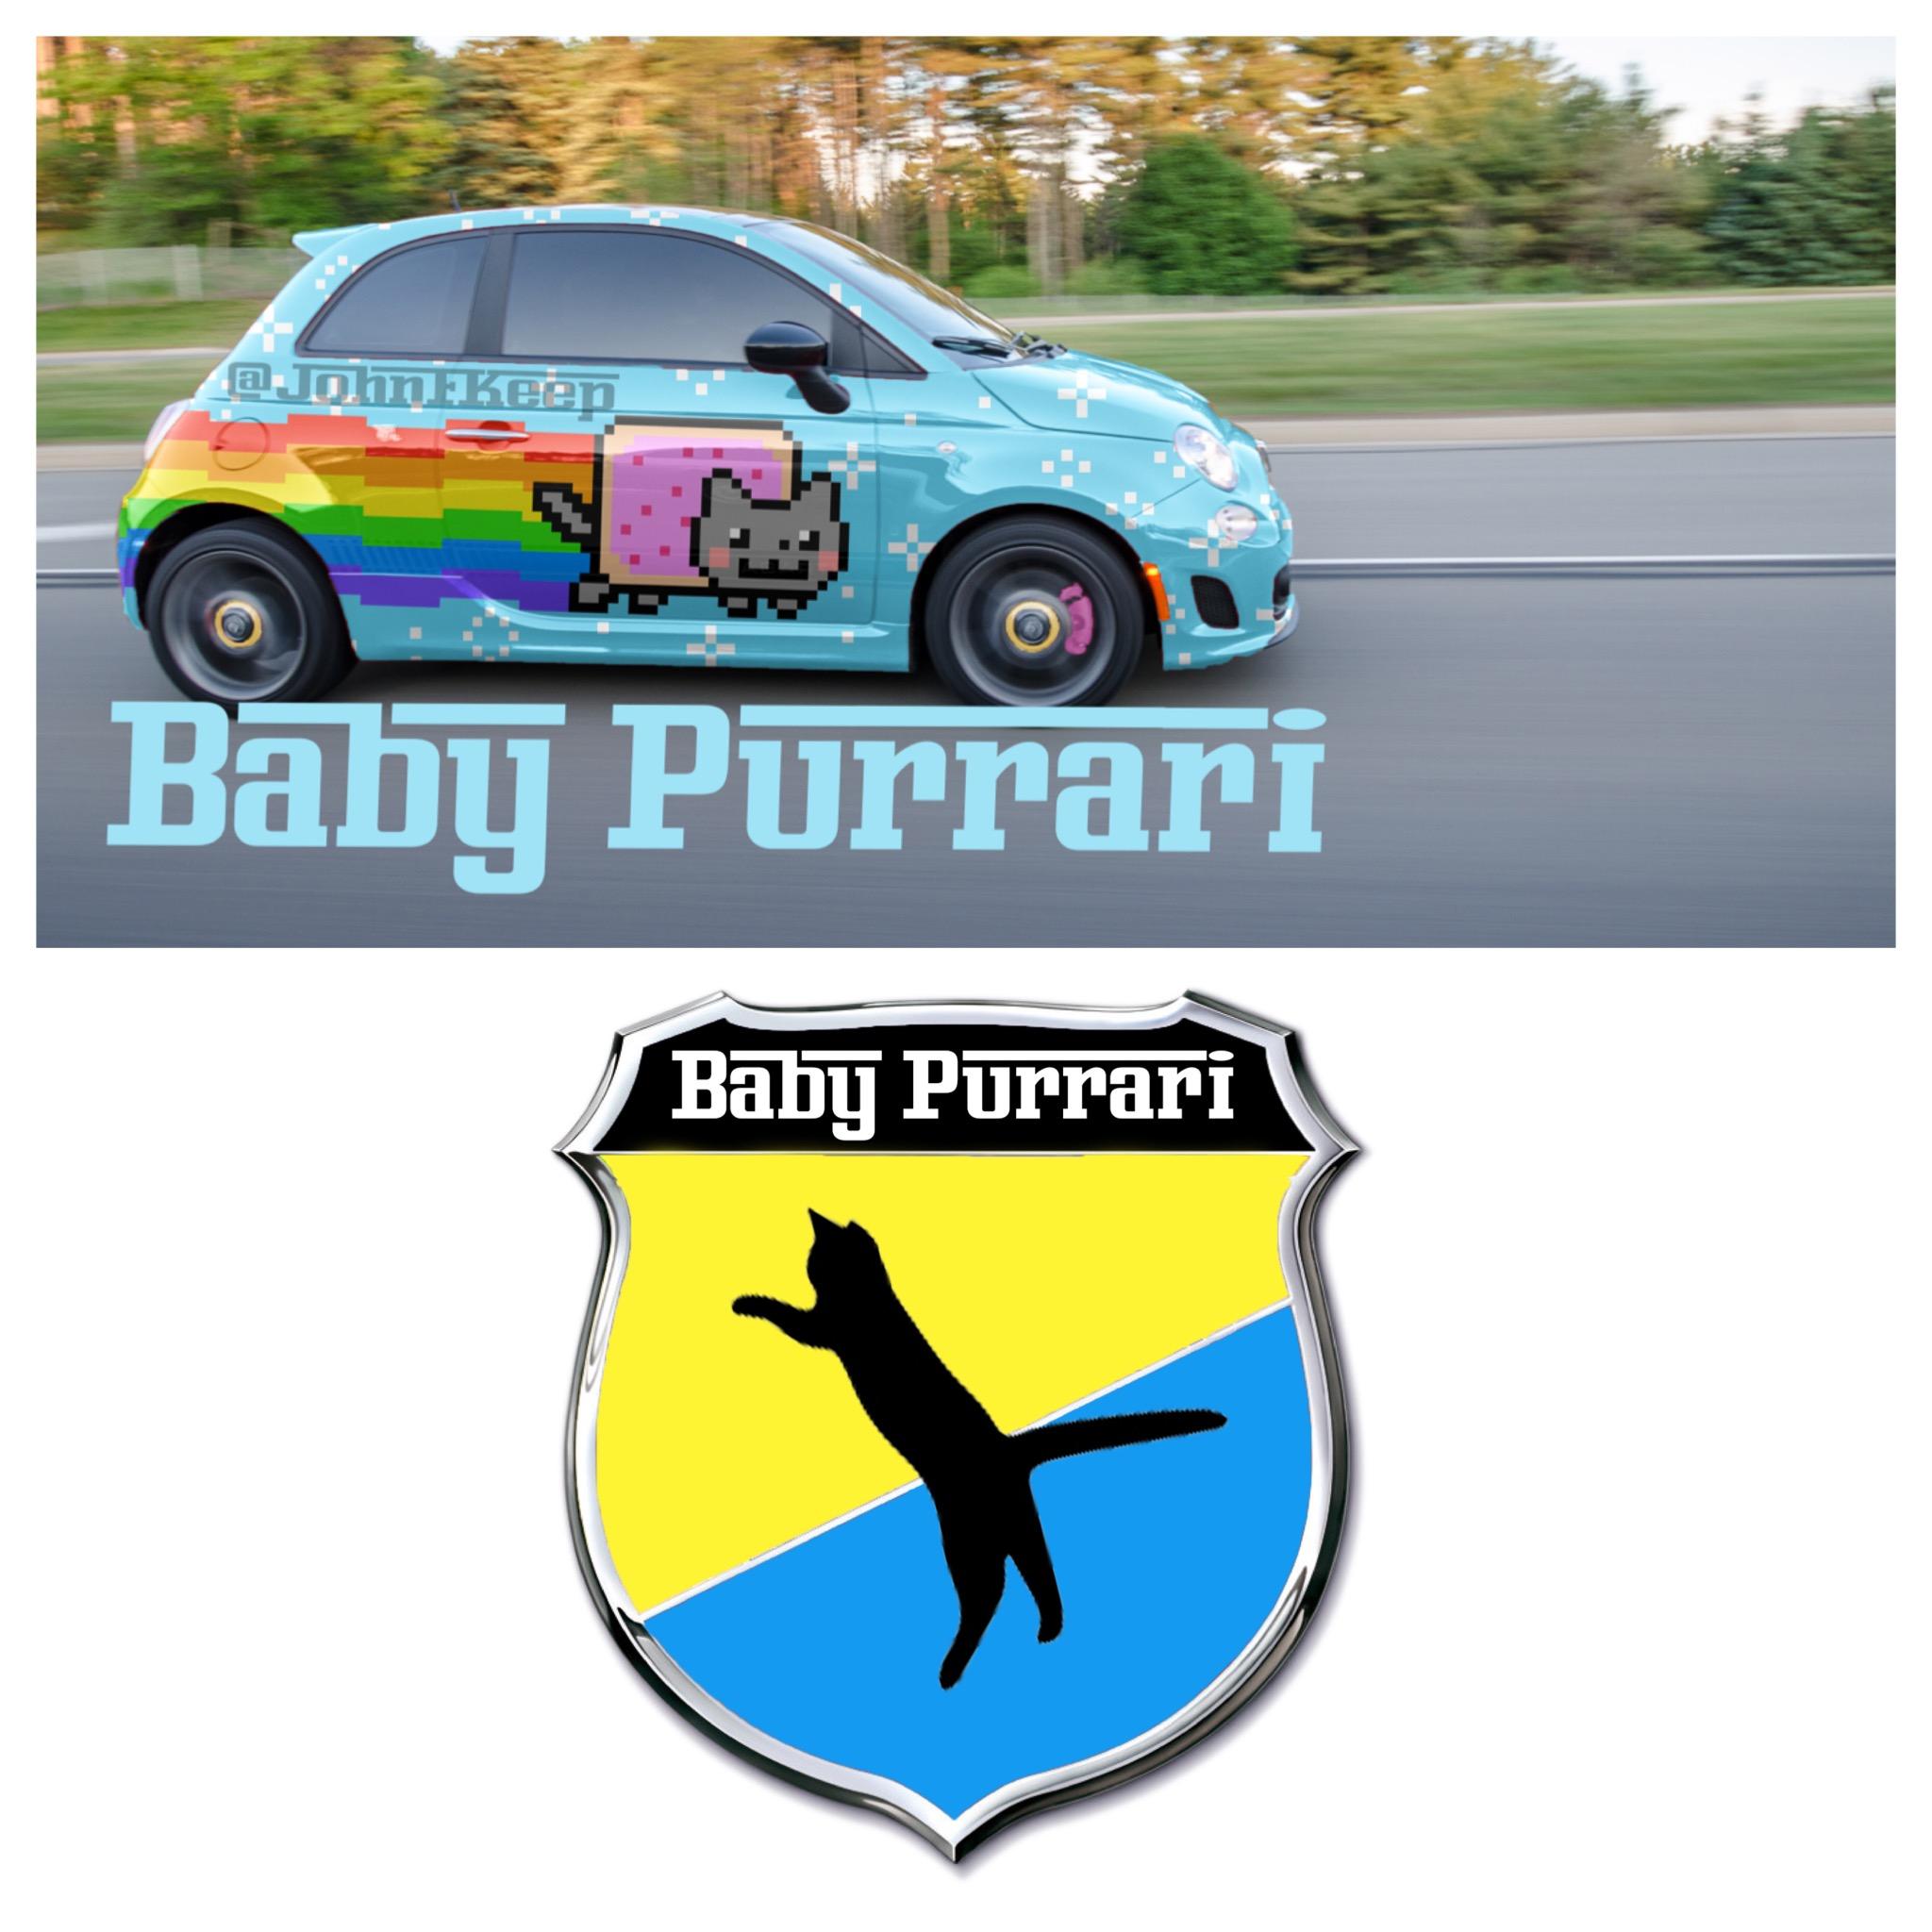 Baby Purrari Abarth Rendering Is Digitally Trolling